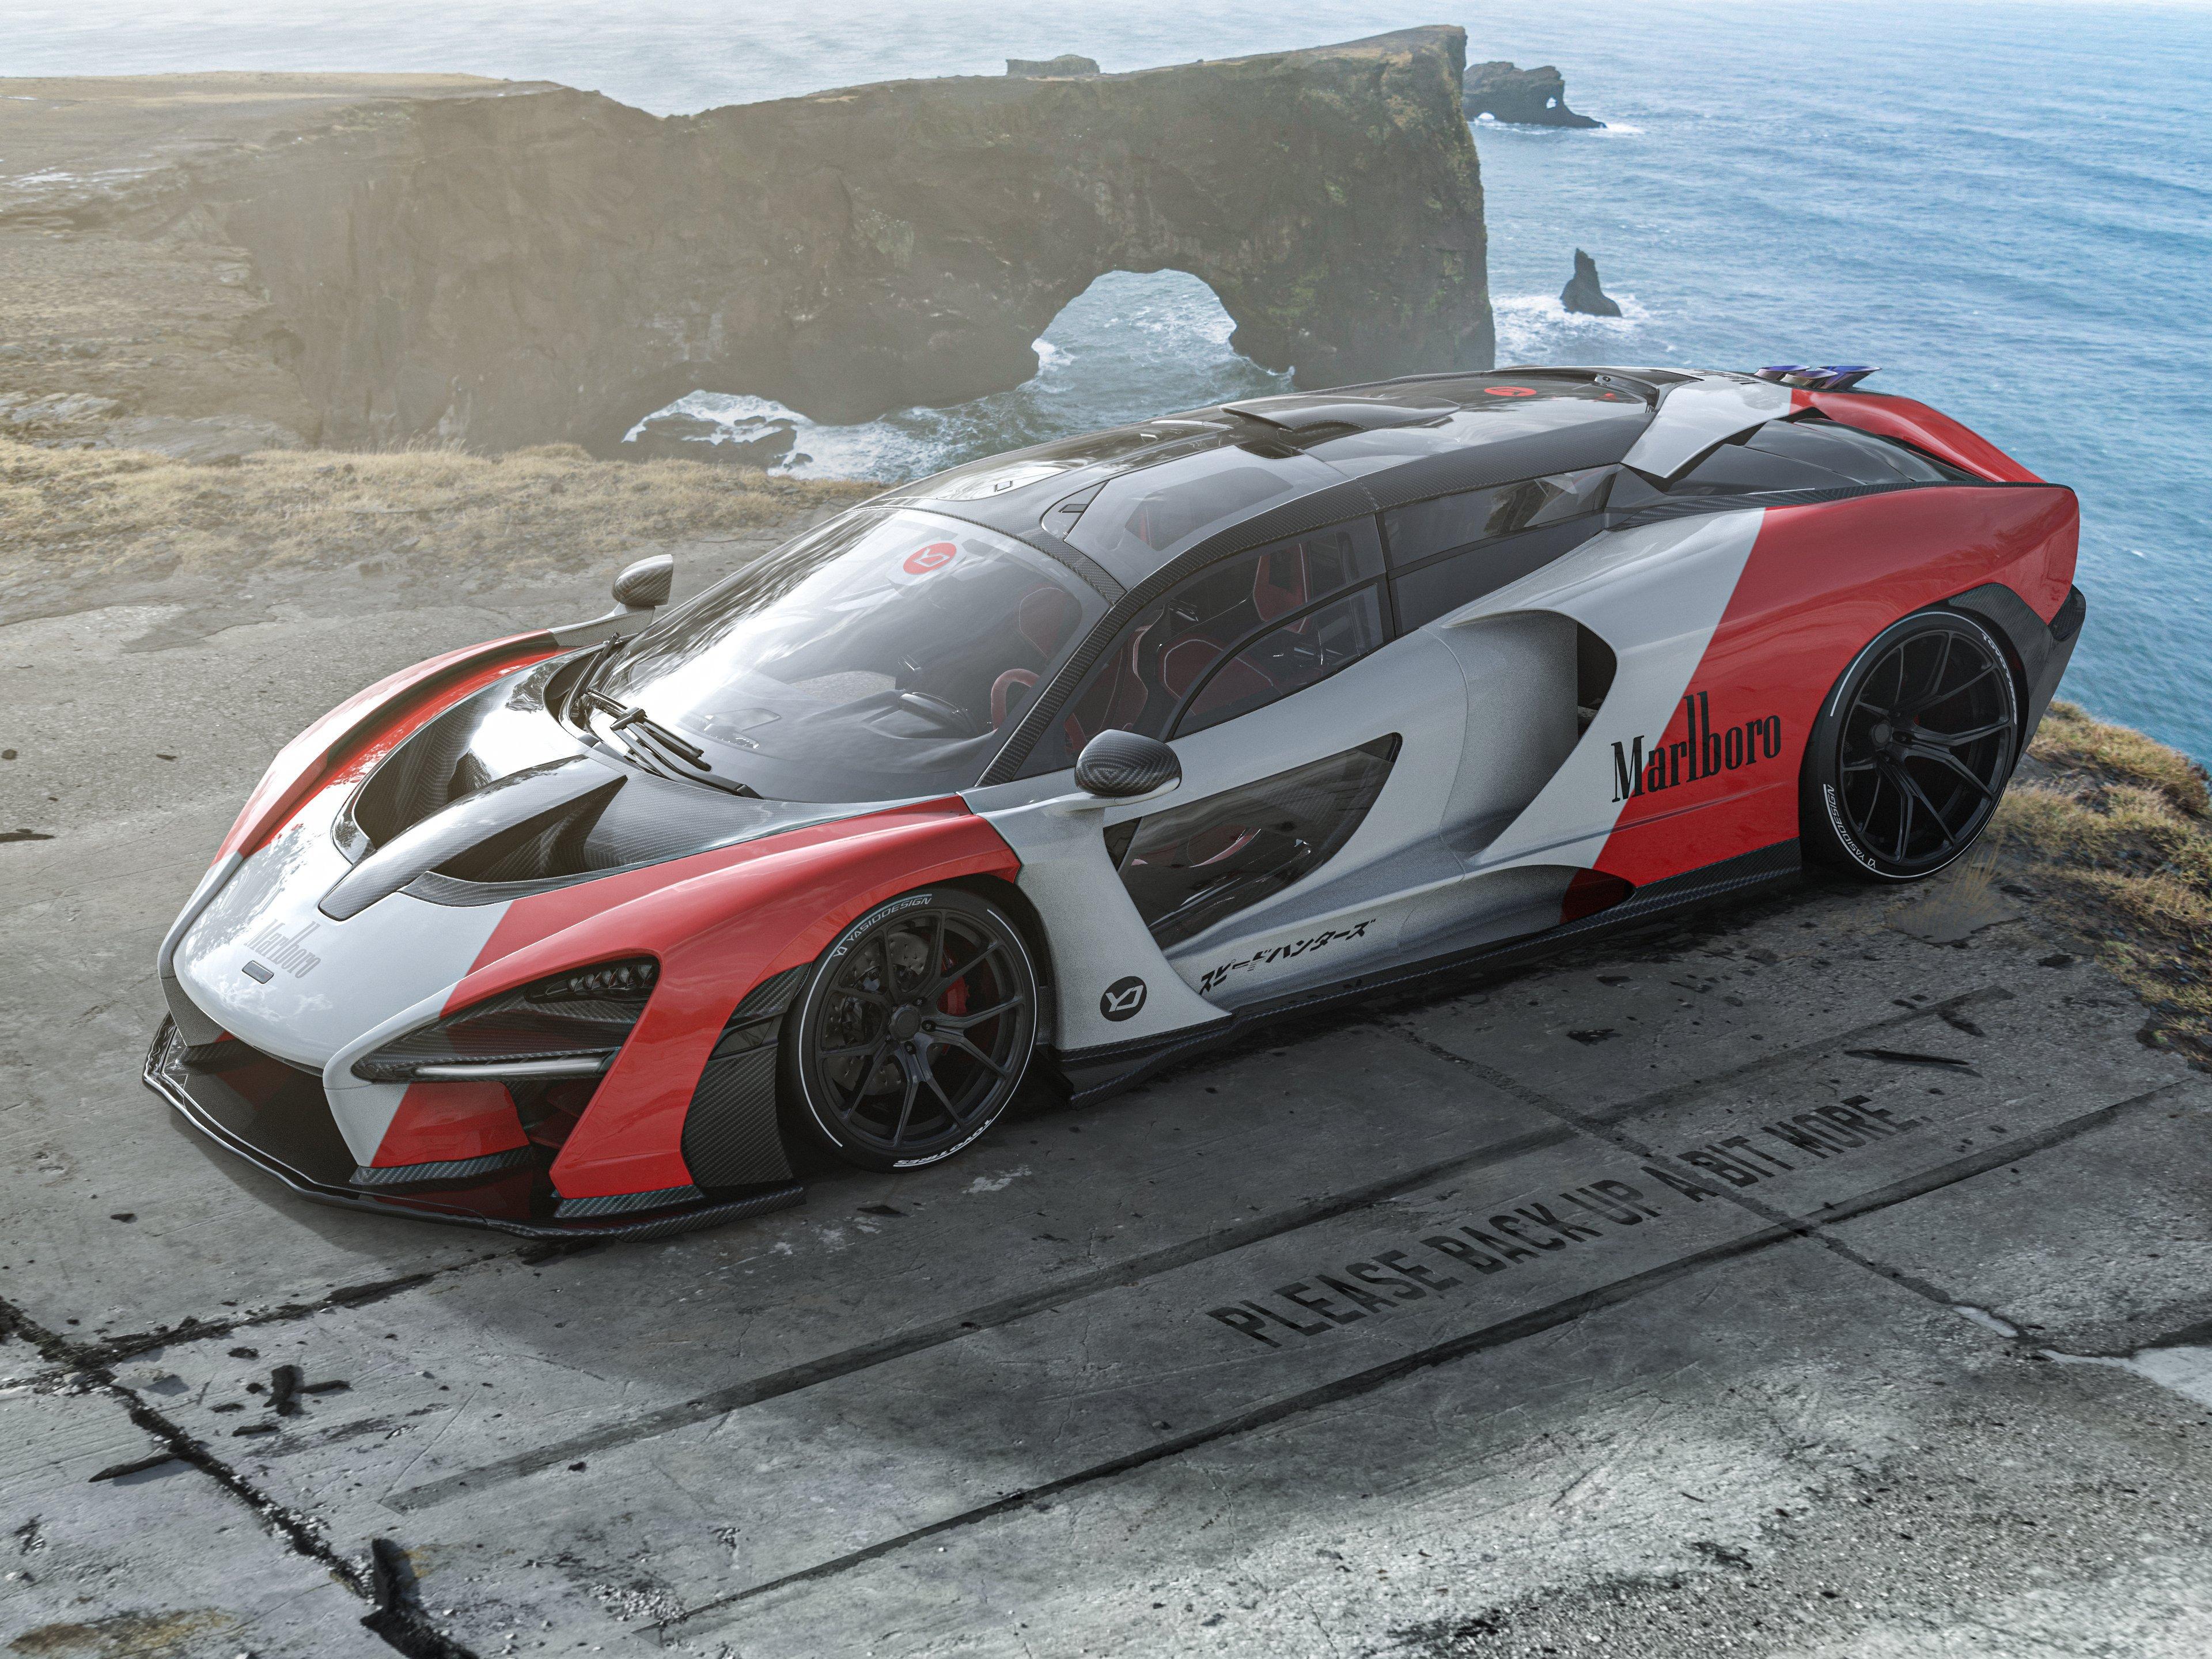 Mclaren F1 4k, HD Cars, 4k Wallpapers, Images, Backgrounds ...